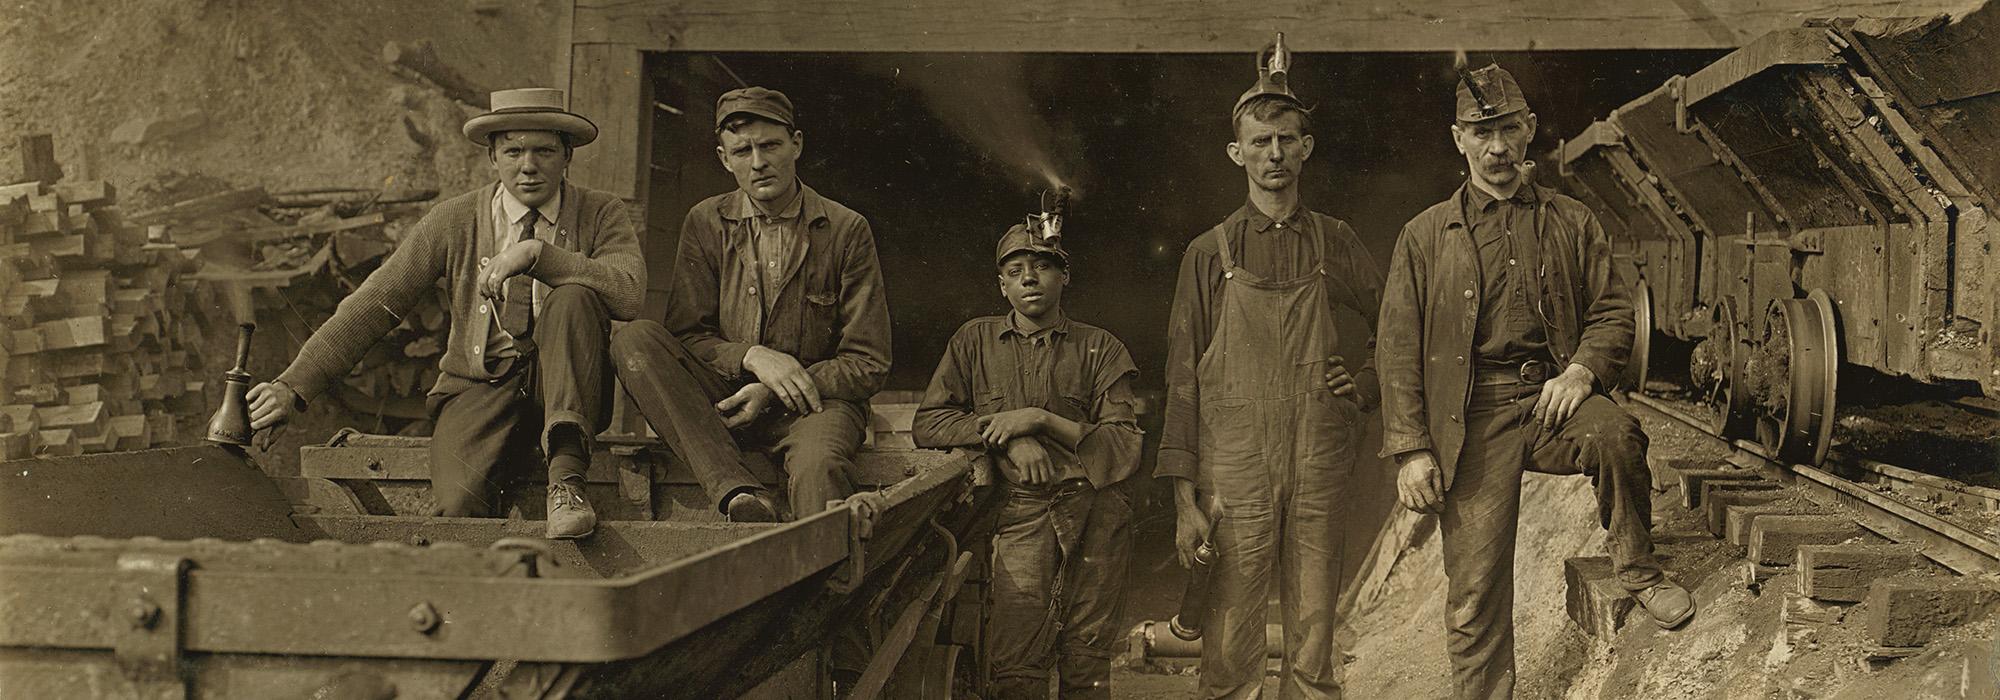 Miners_LewisHines_hero.jpg